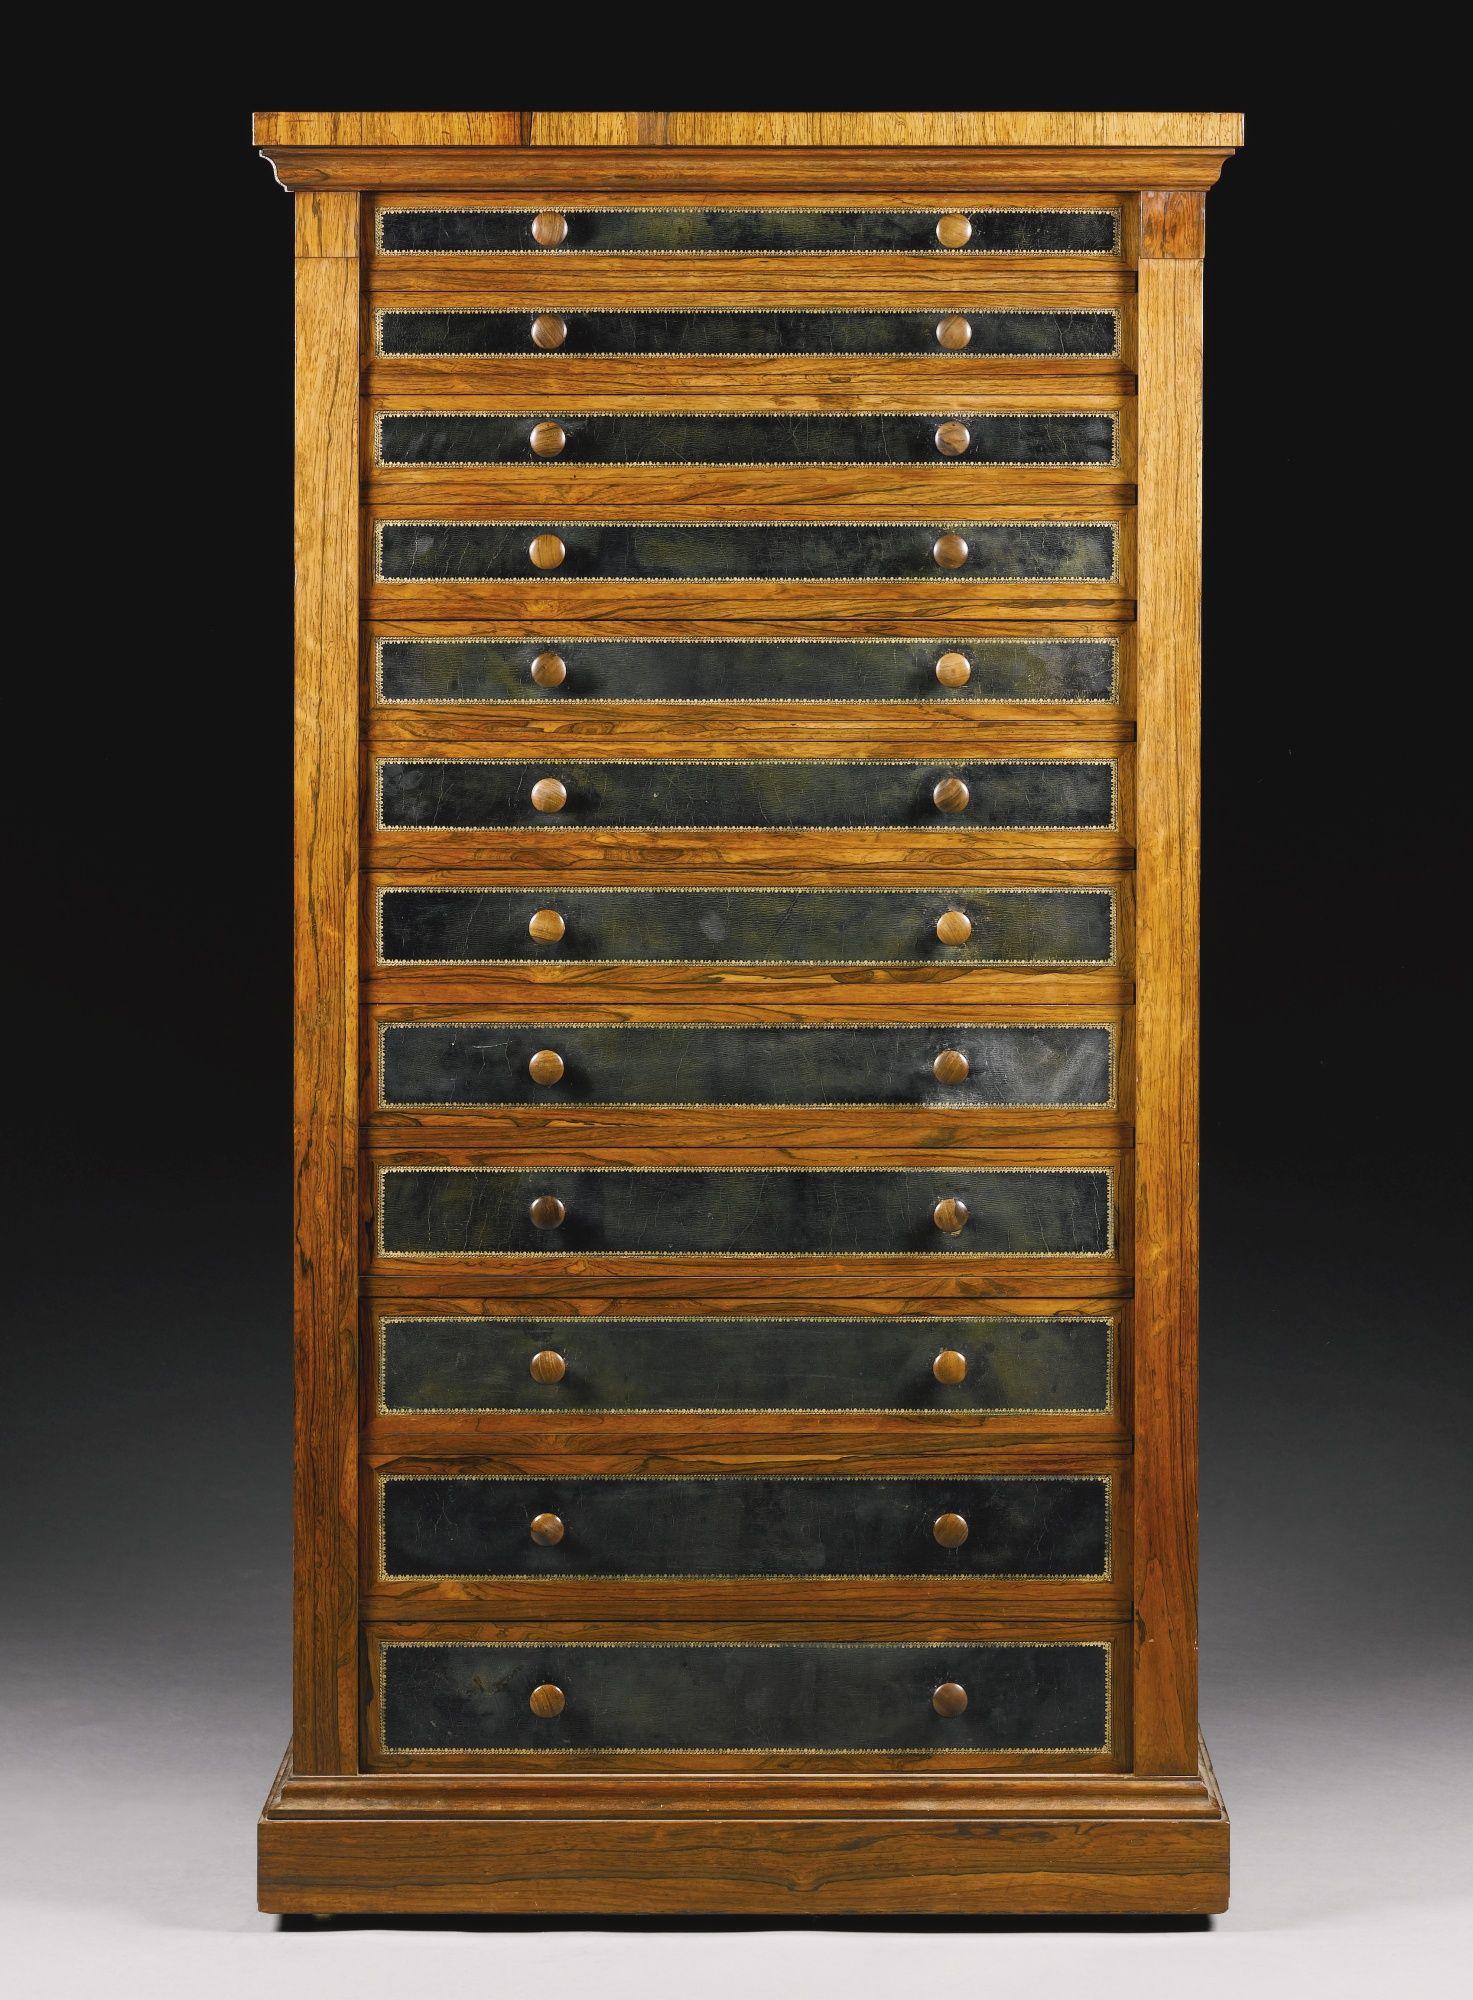 A George Iv Rosewood Wellington Chest Circa 1830 Lot Sotheby S Vintage Storage Cabinet Cupboard Vintage Furniture